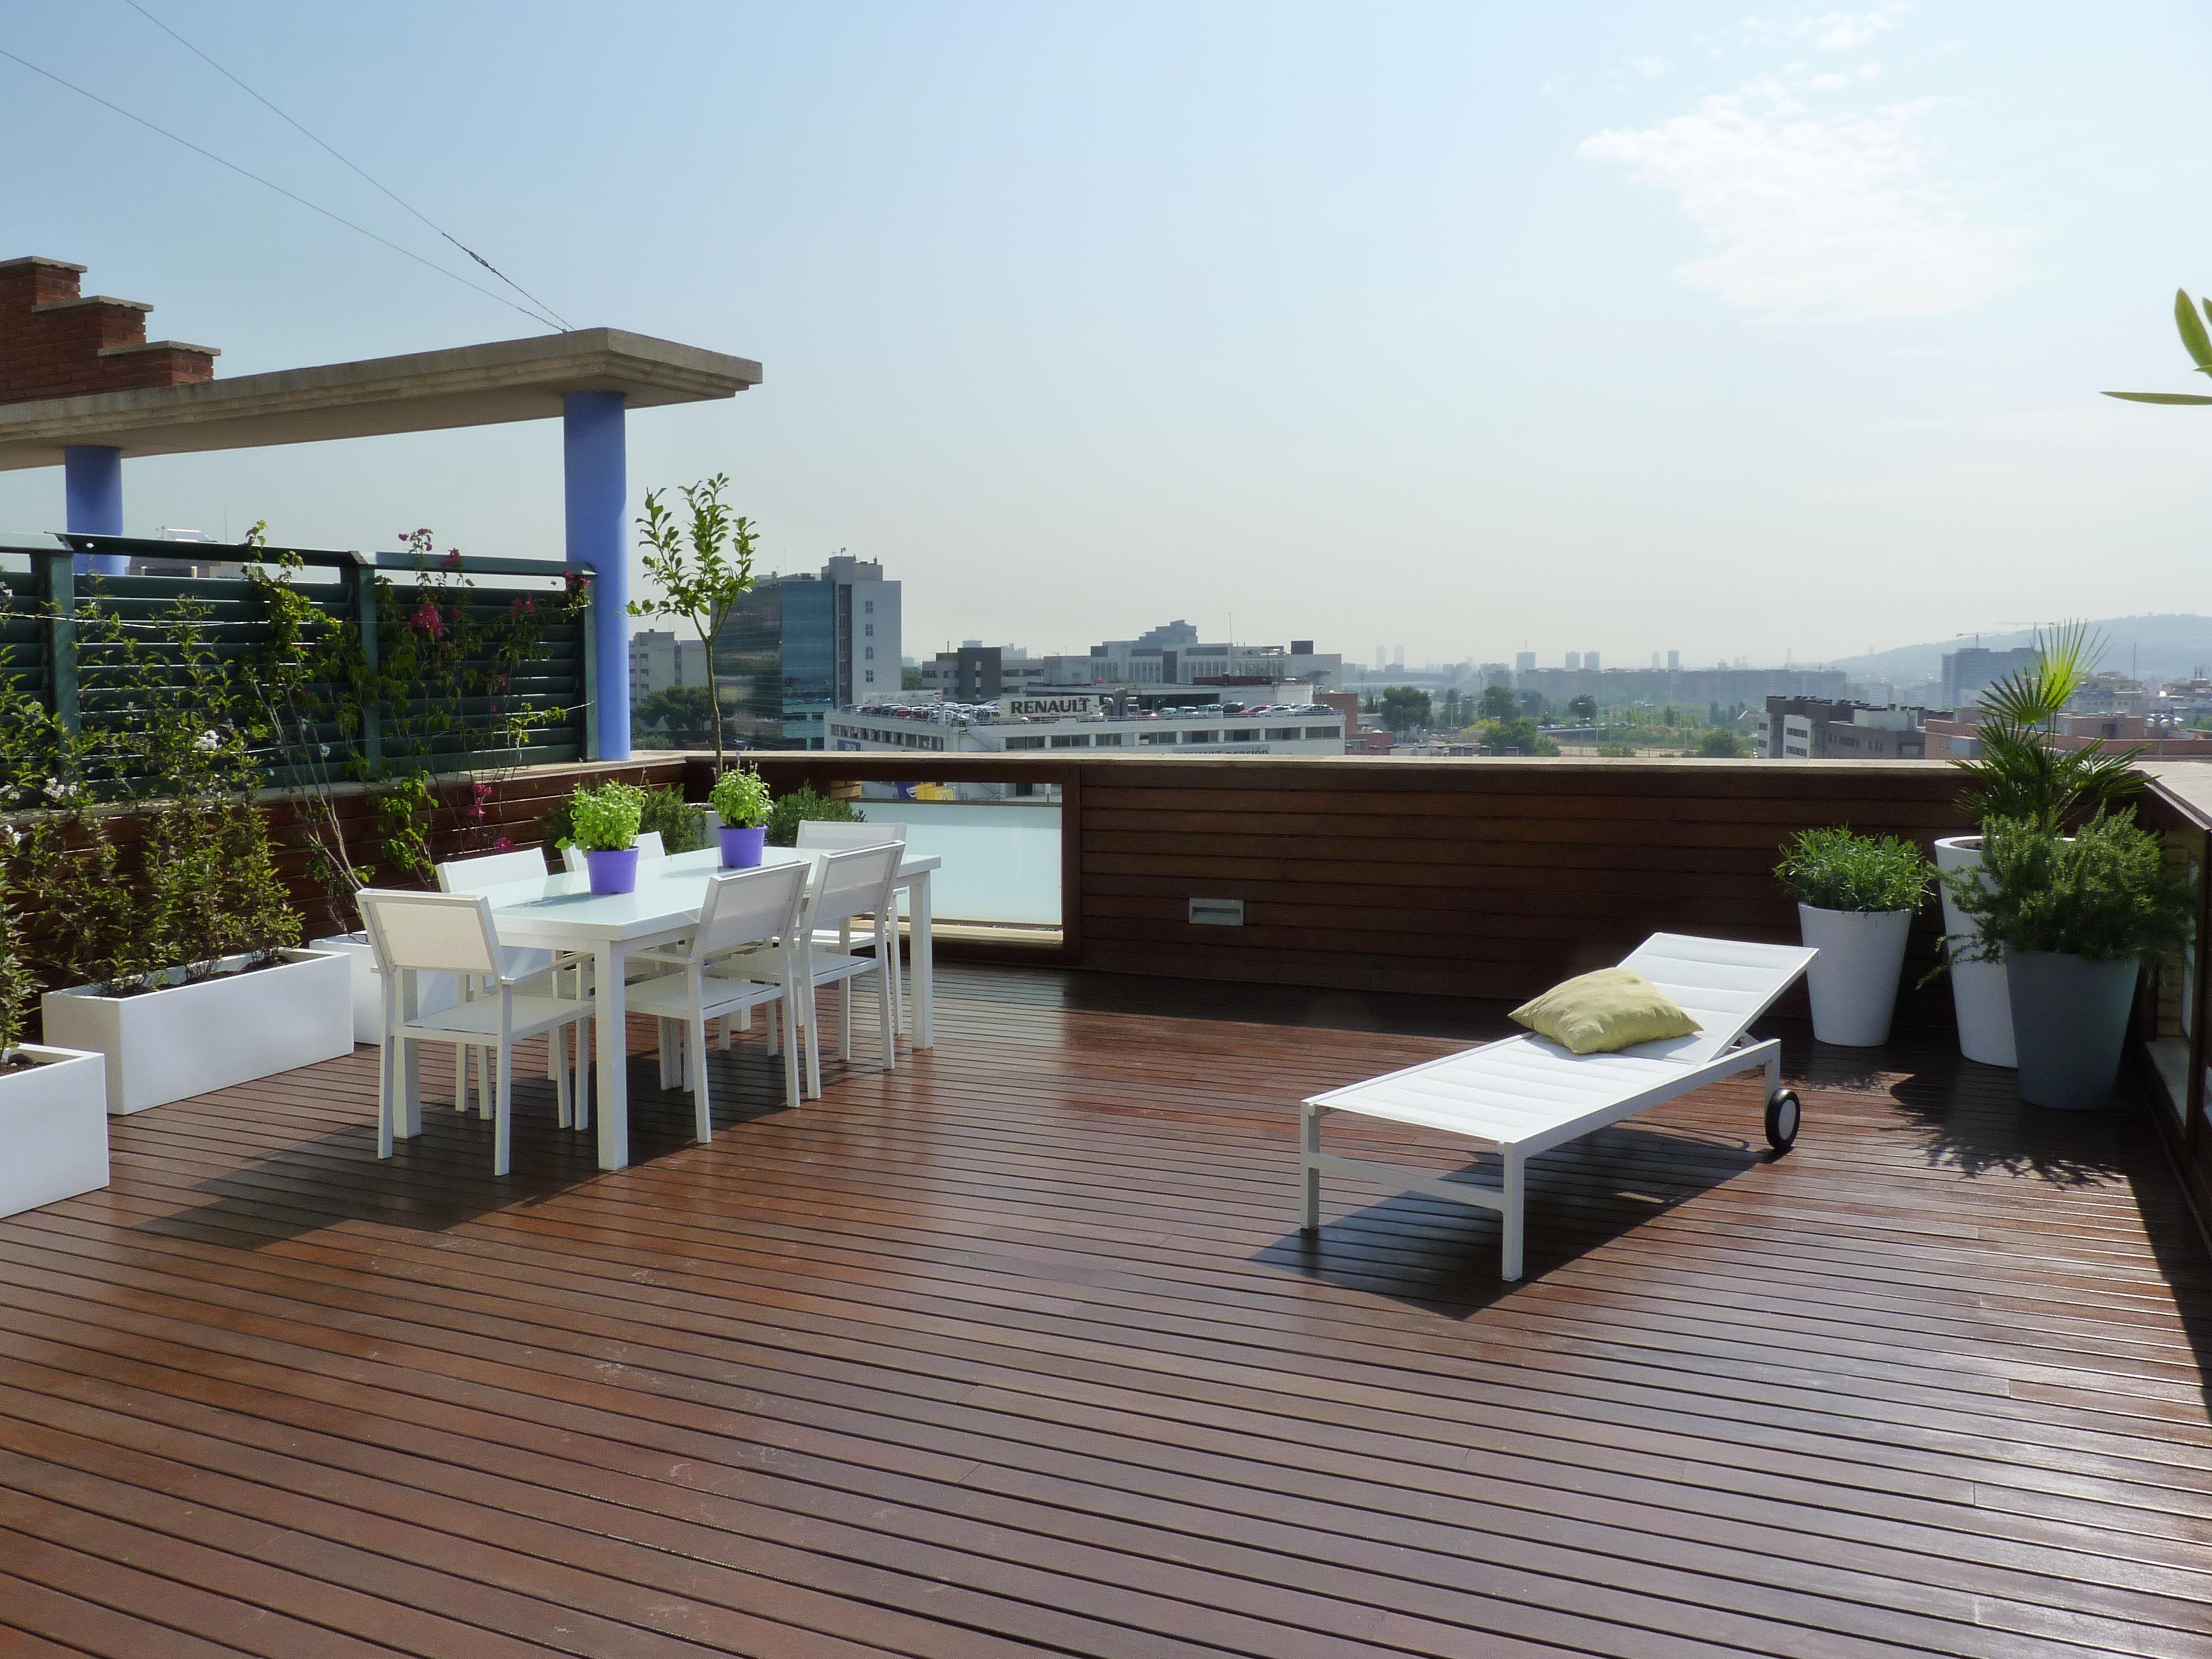 ideas de paisajismo de exterior terraza estilo